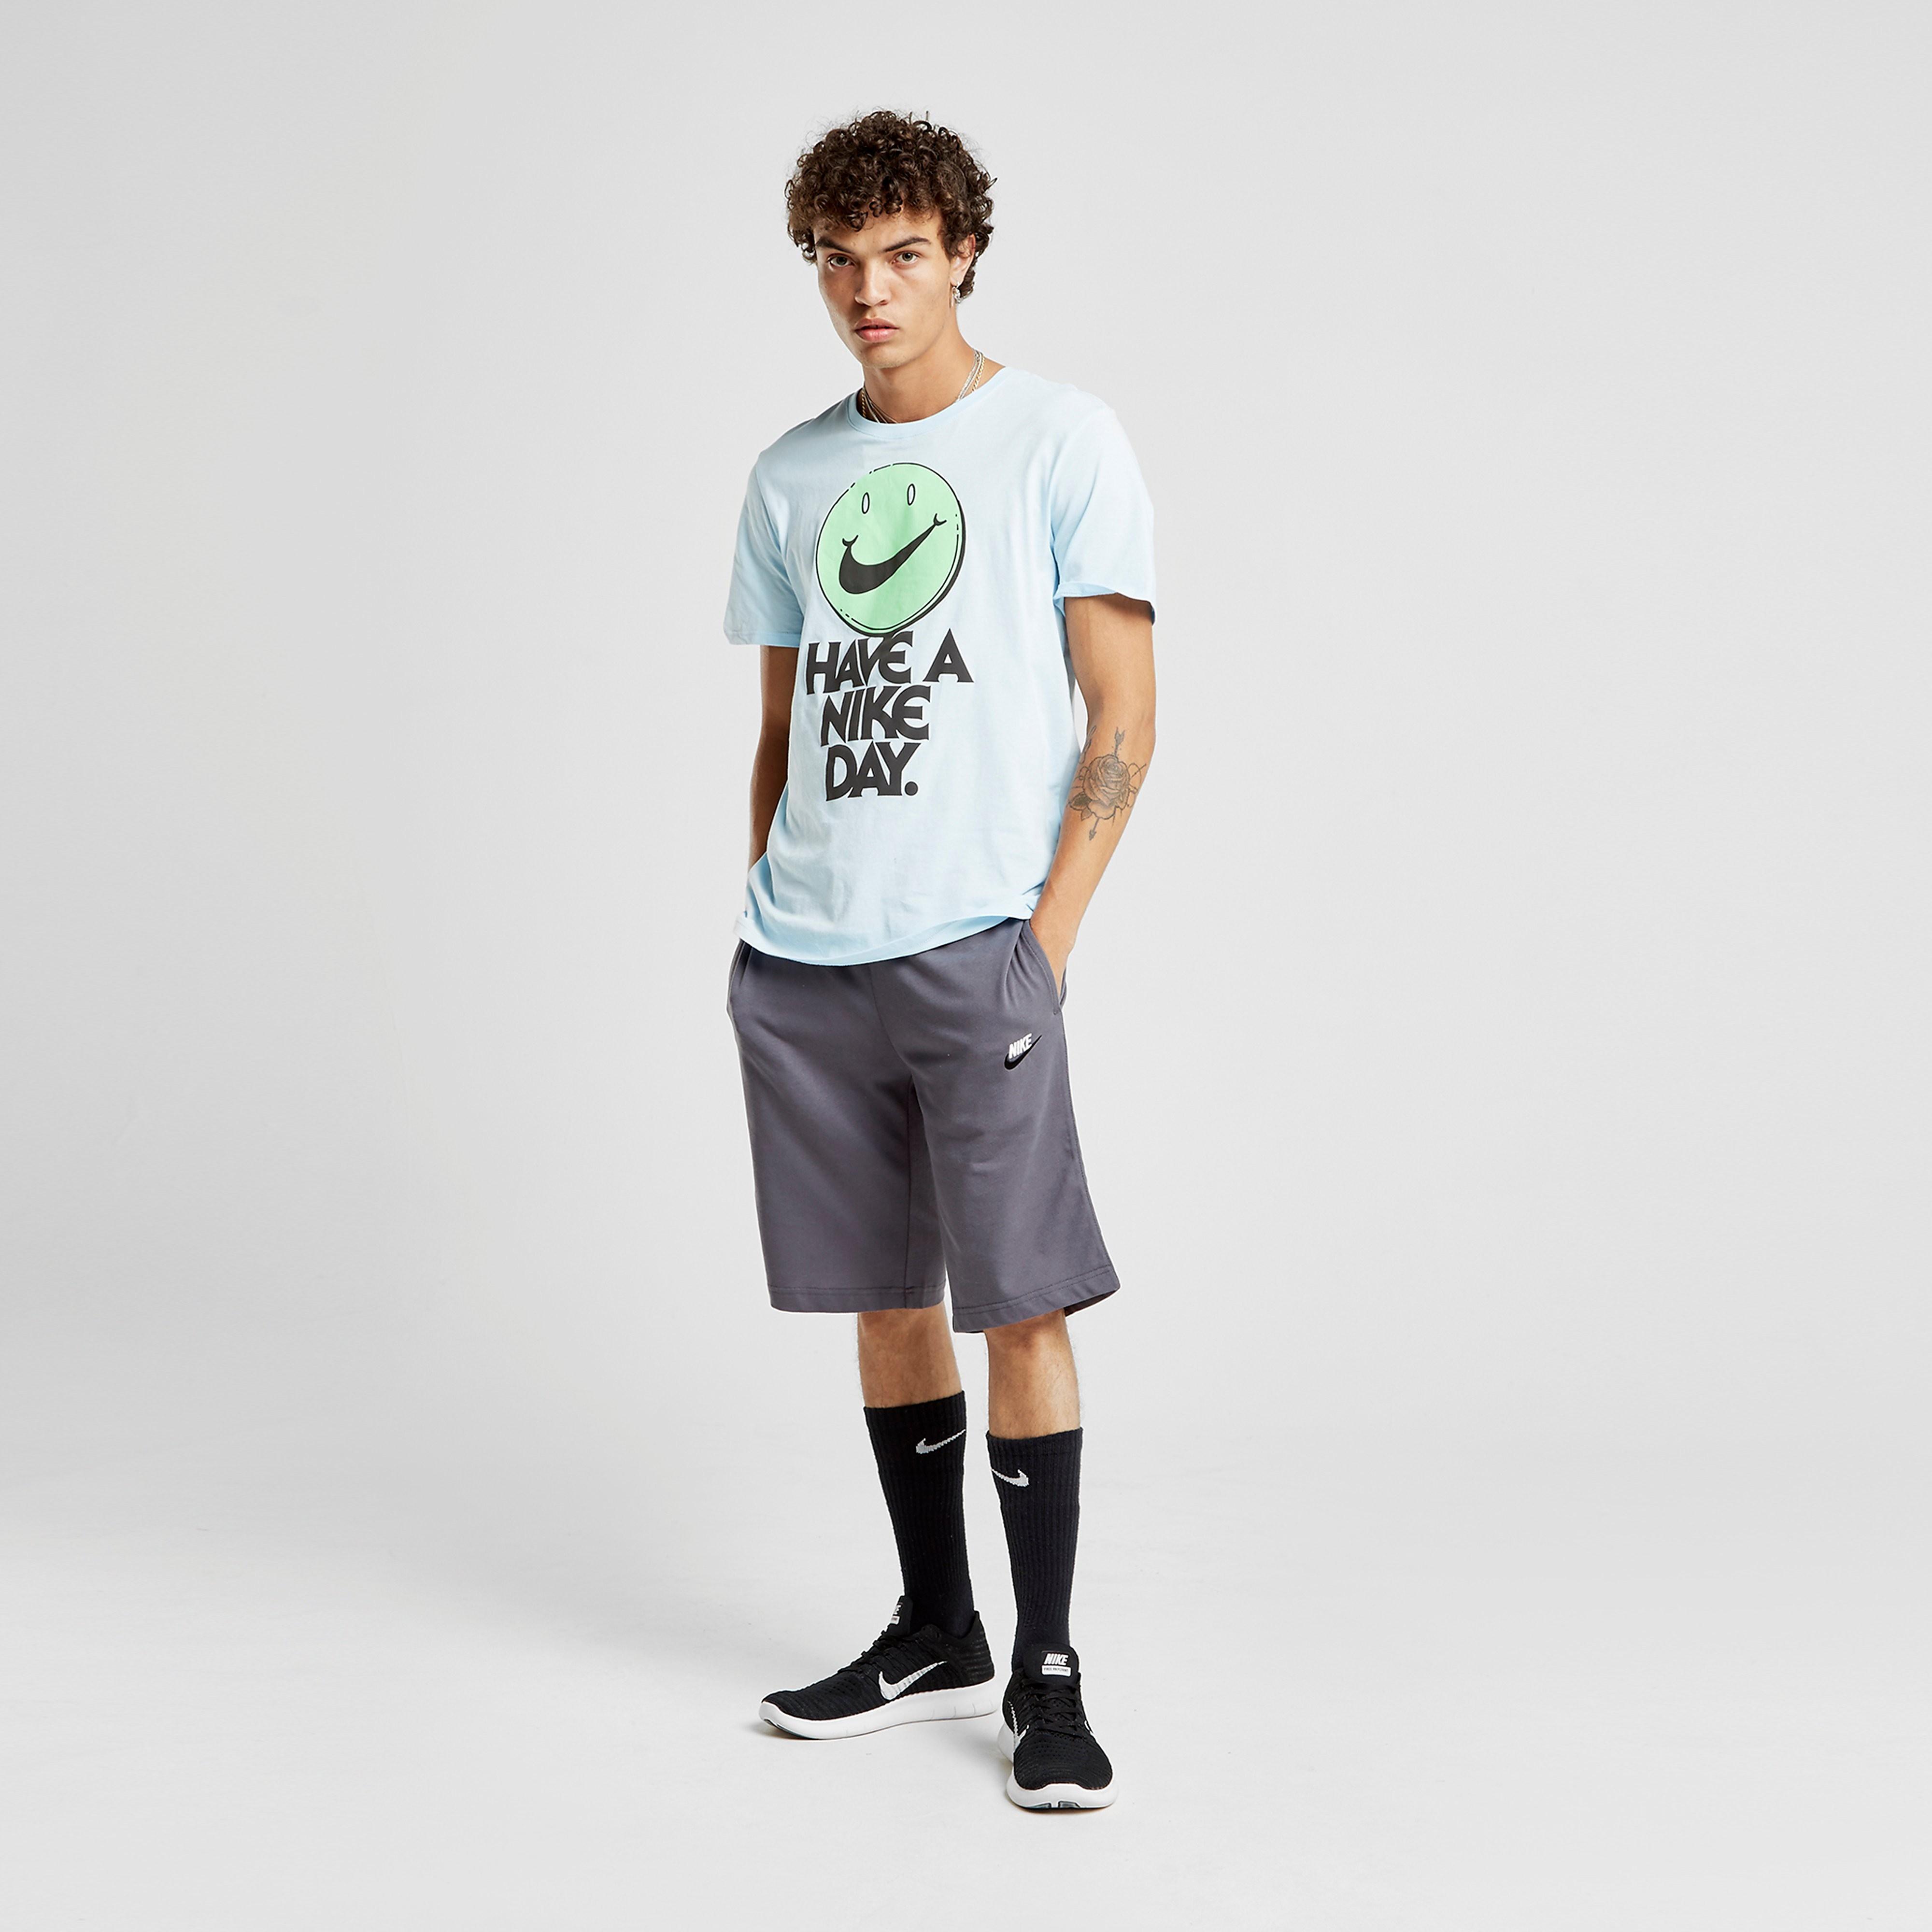 Sportiply Sportiply Sportswear bei Sportiply Sportiply bei bei Sportswear bei Sportswear Sportiply Sportswear Sportswear bei e2D9YWEHI